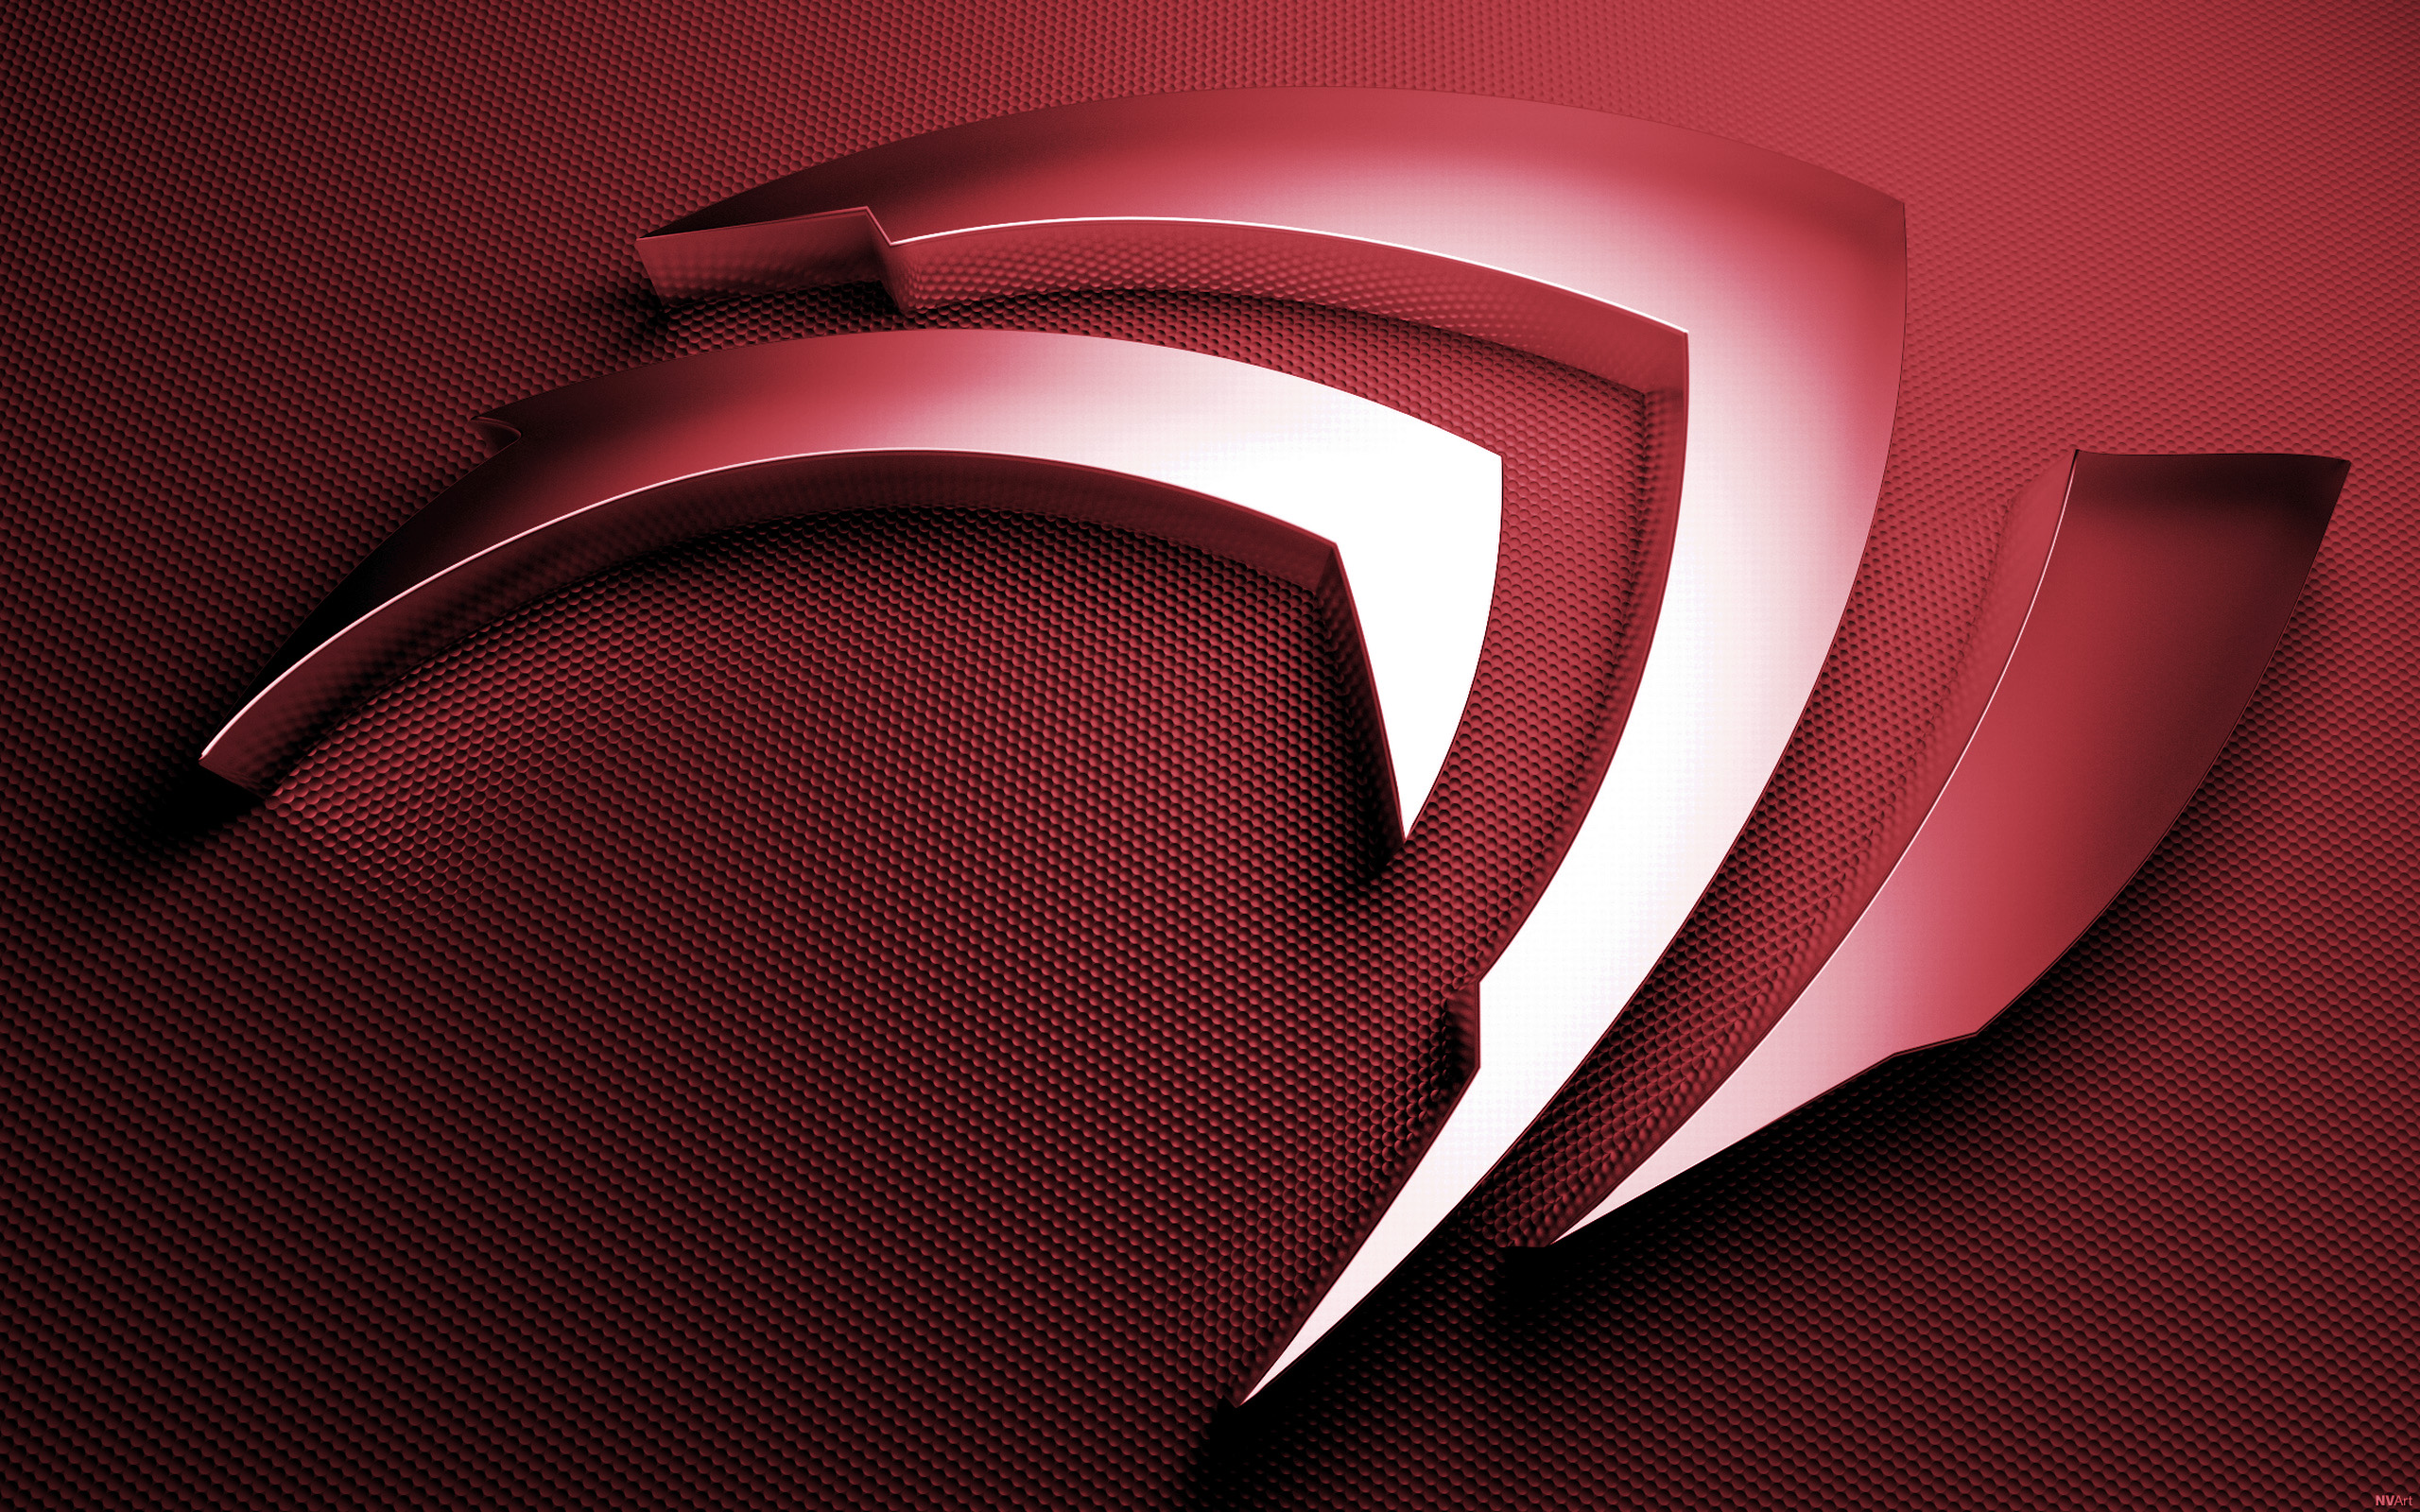 nvidia wallpaper 1080p red - photo #21